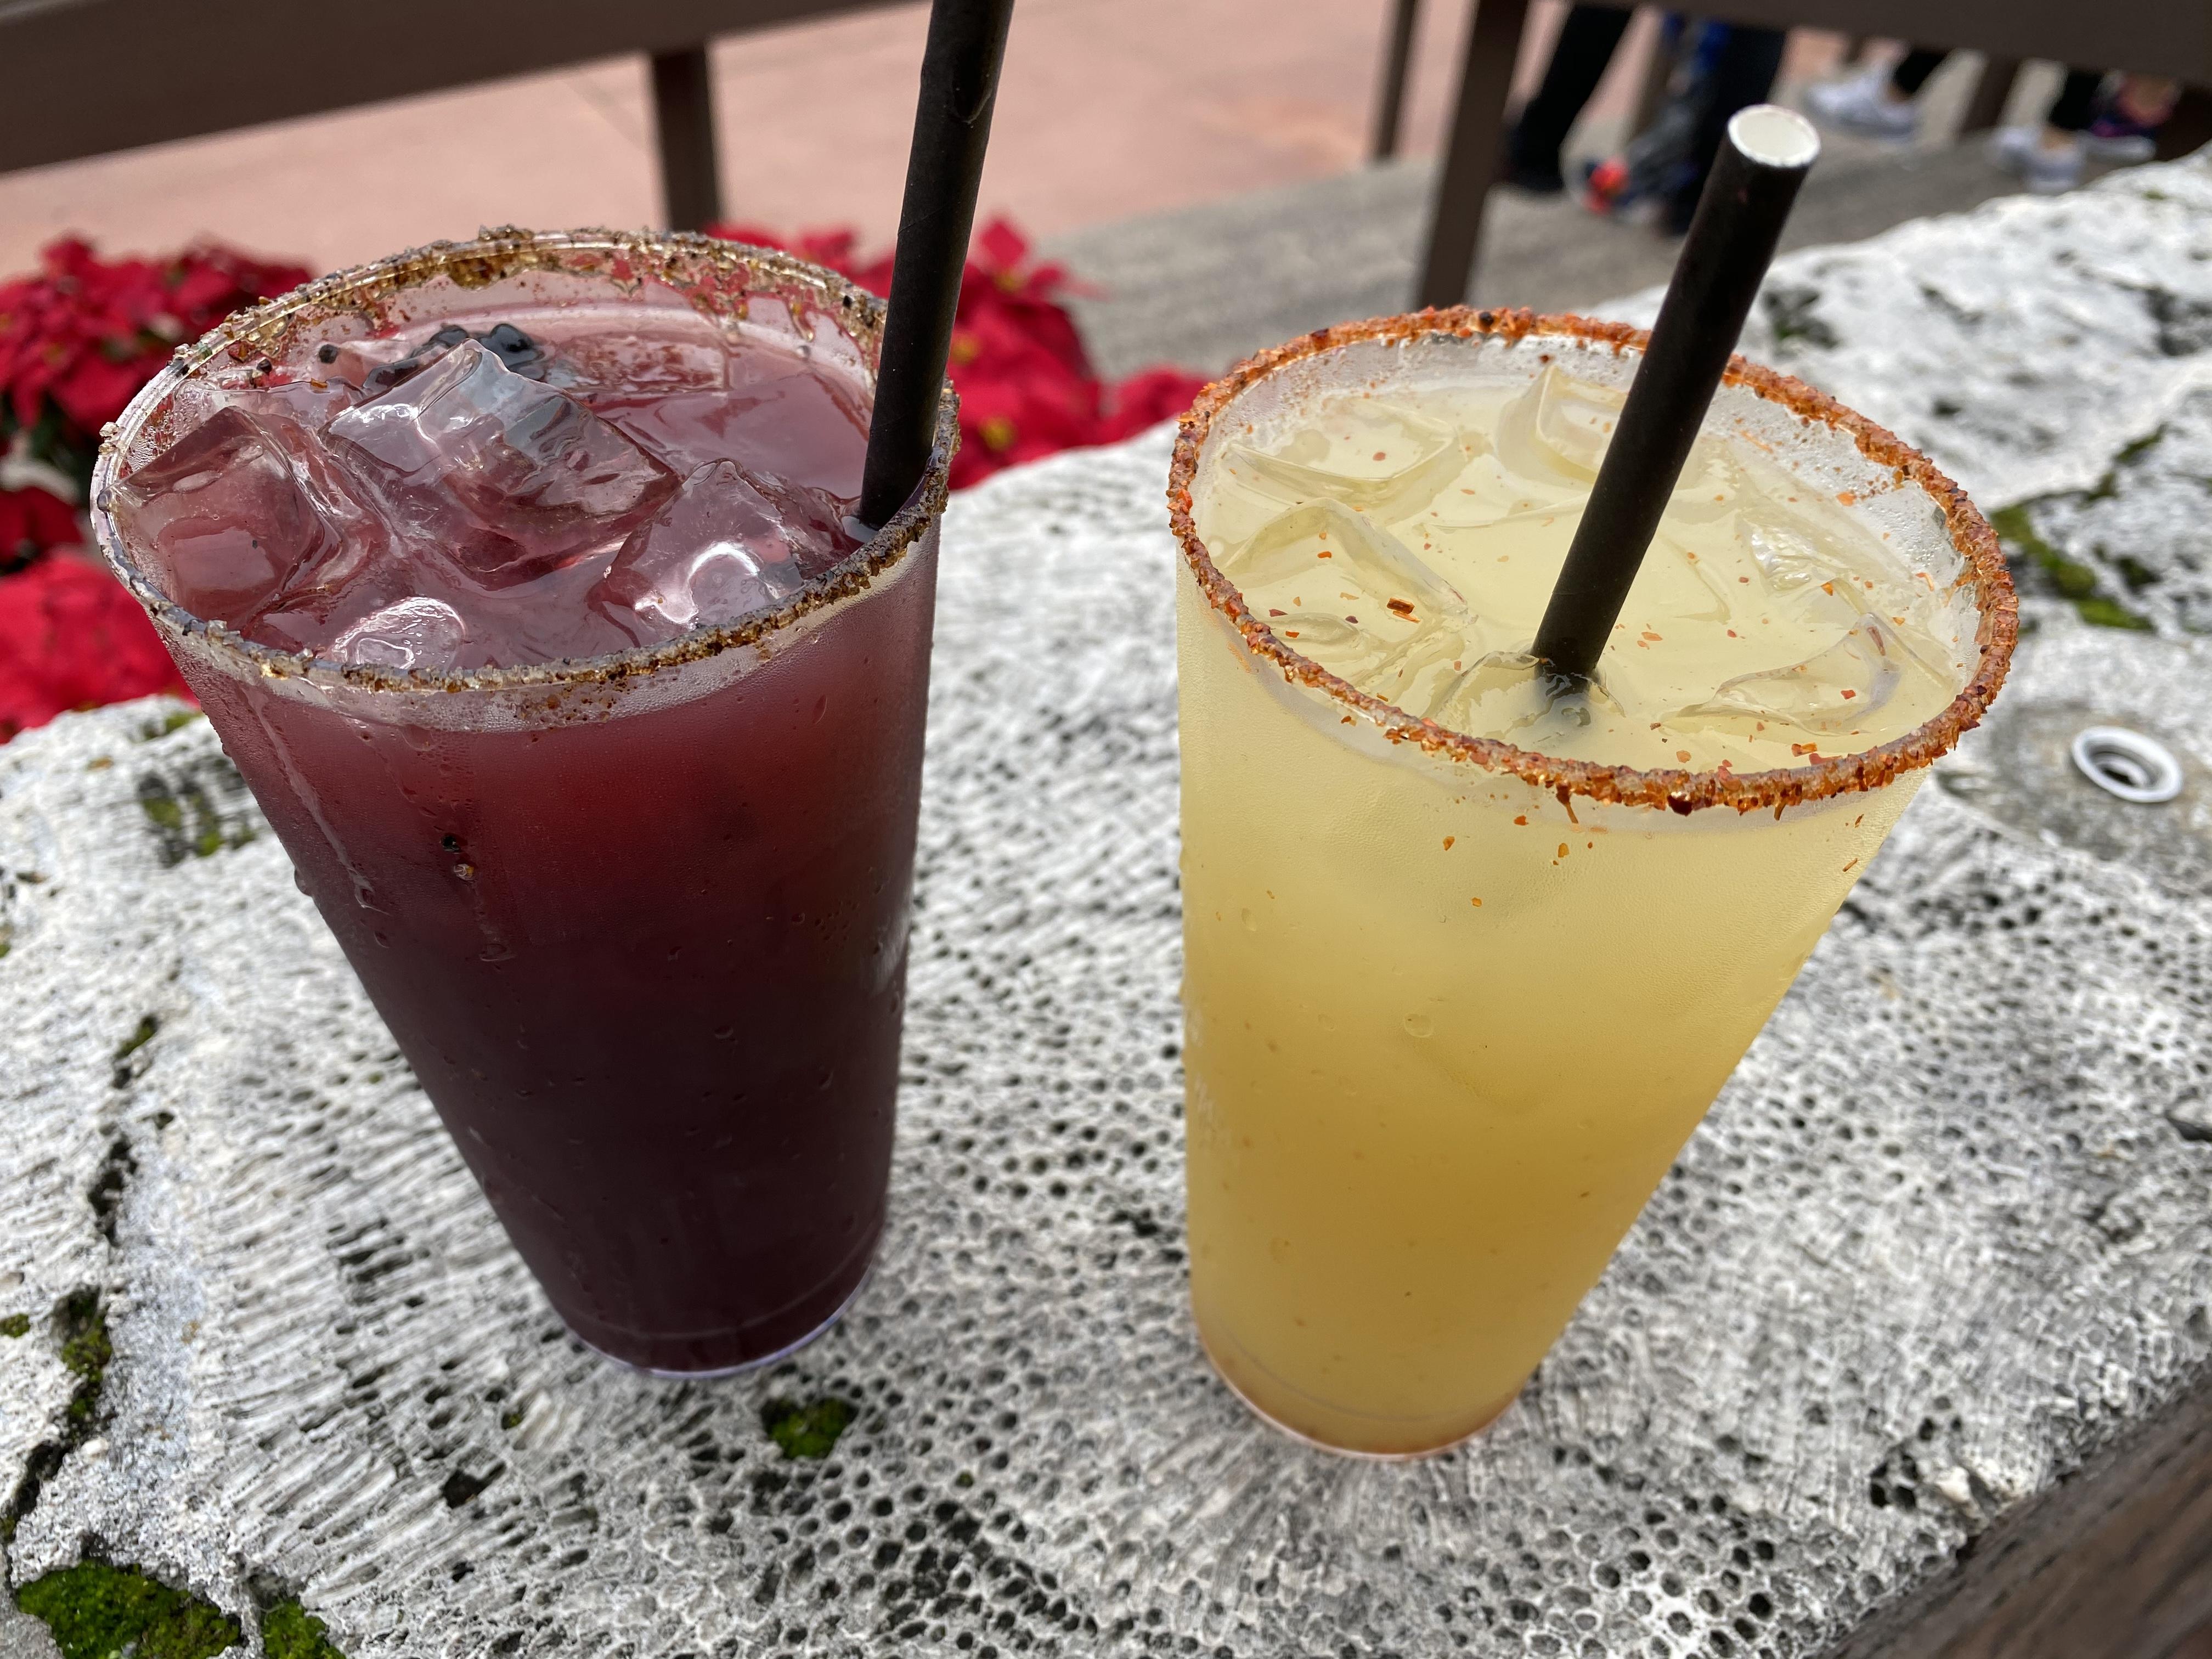 Choza de Margarita Spicy Blackberry Smoky Pineapple Margaritas